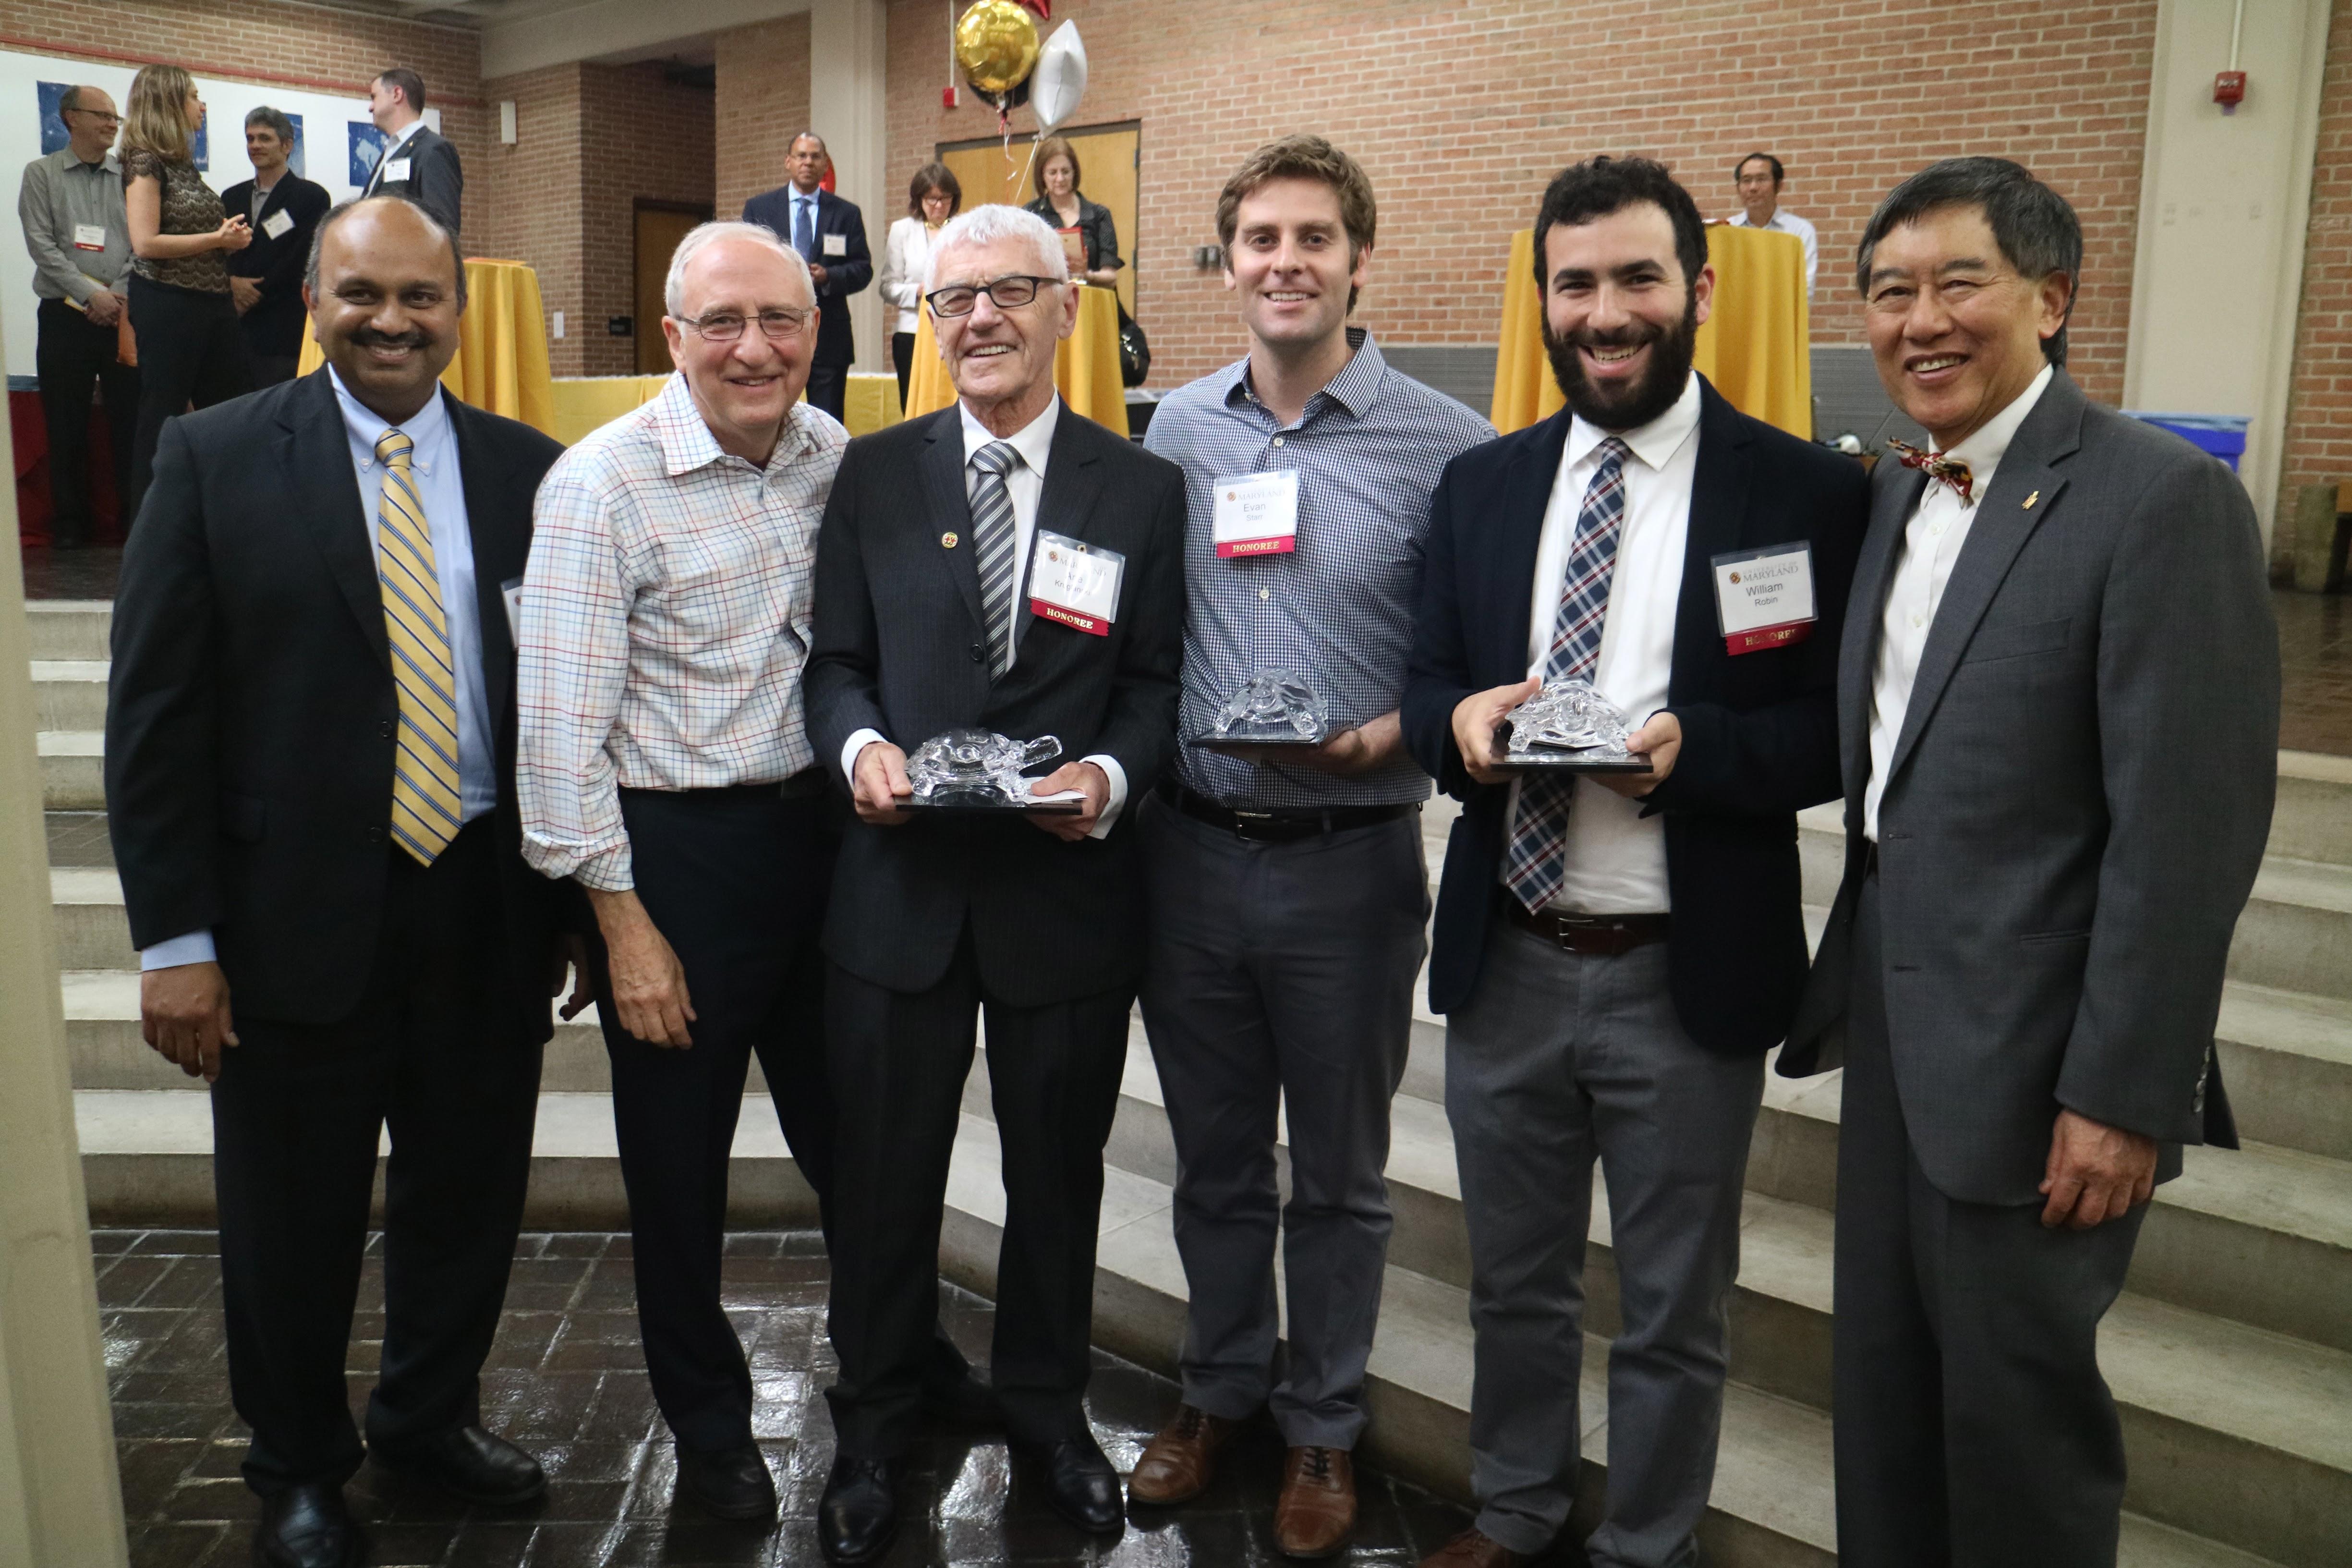 L-R: Interim Vice President for Research Amitabh Varshney, Ben Shneiderman, Arie Kruglanski, Evan Starr, William Robin, and President Wallace Loh.